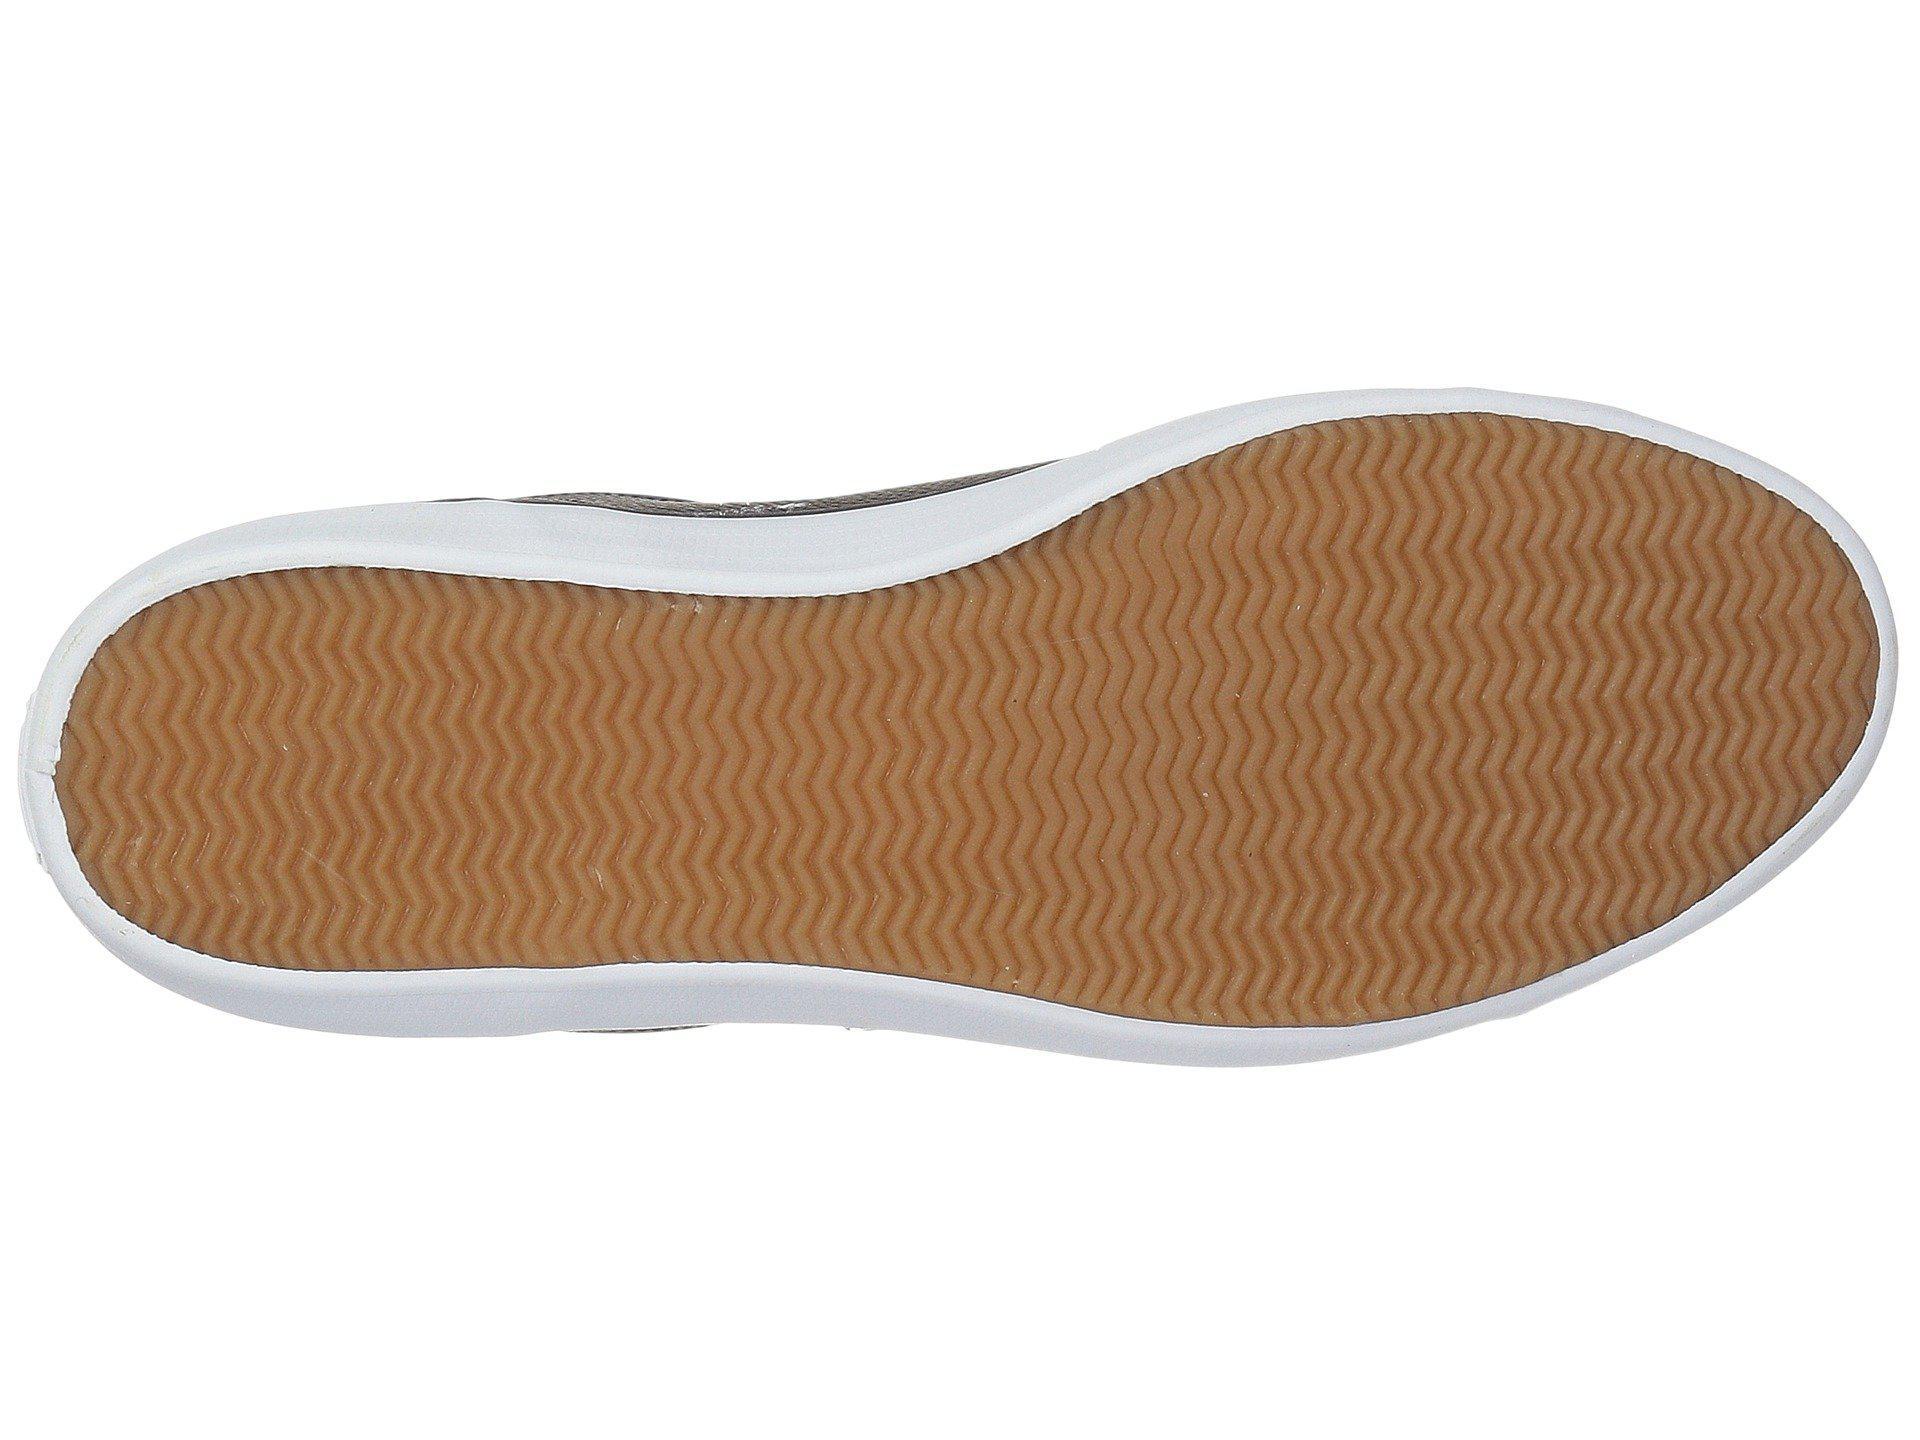 680e5a4189b8a Lyst - Lacoste Lerond 118 1 U (black grey) Men s Shoes in Brown for Men